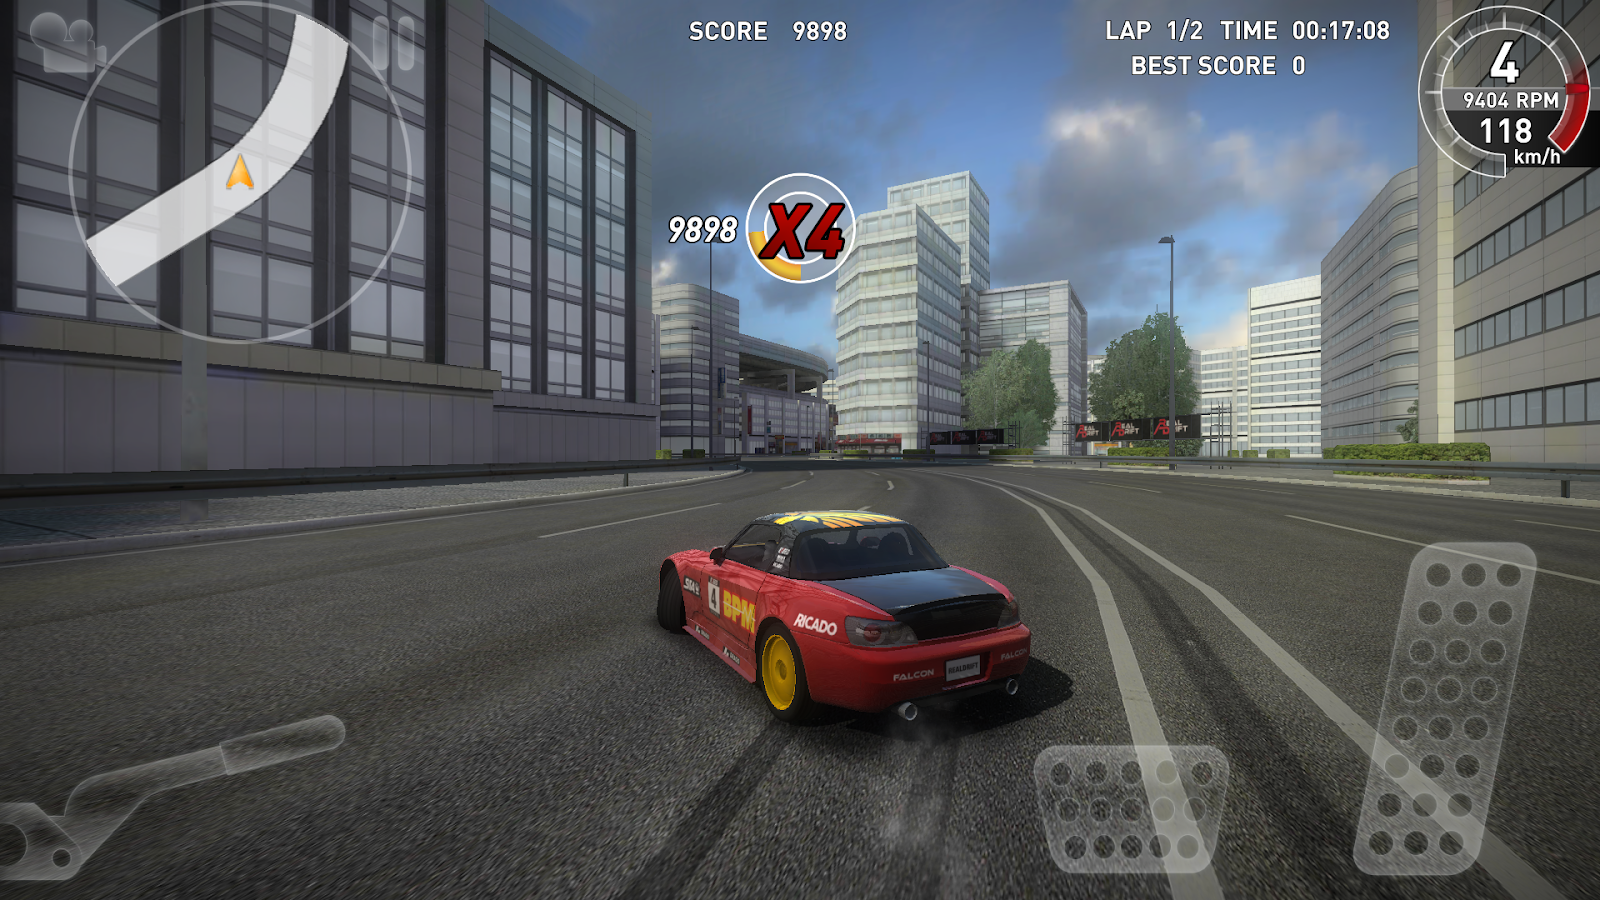 Real Drift Car Racing 5 0 2 APK Download - Android Racing Games